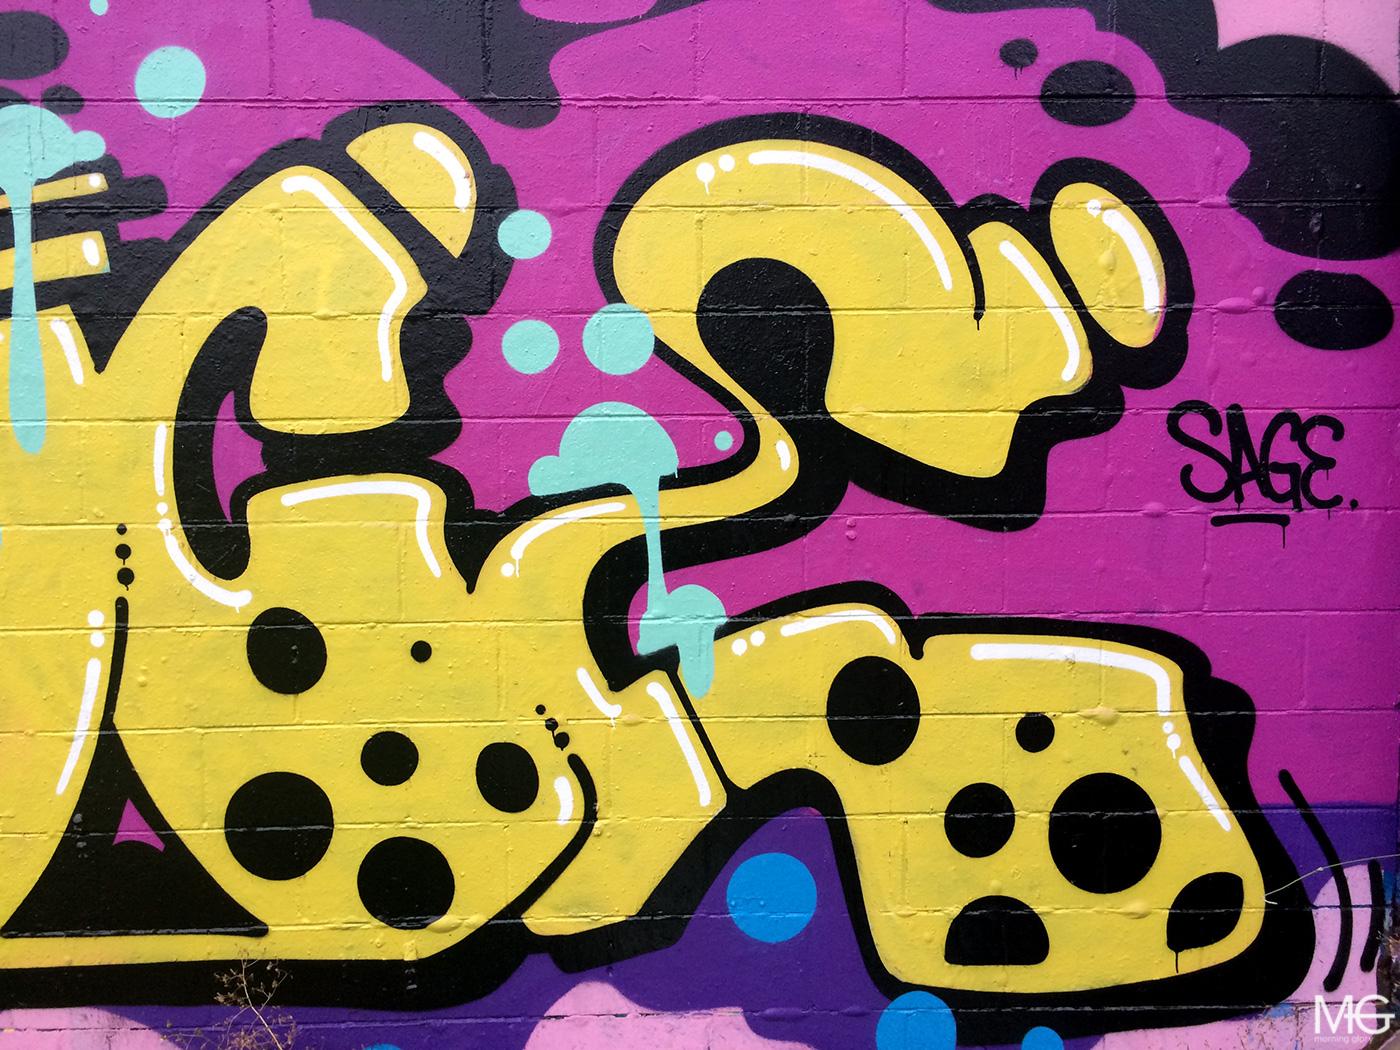 morning-glory-melbourne-graffiti-preston-smut-sauce3